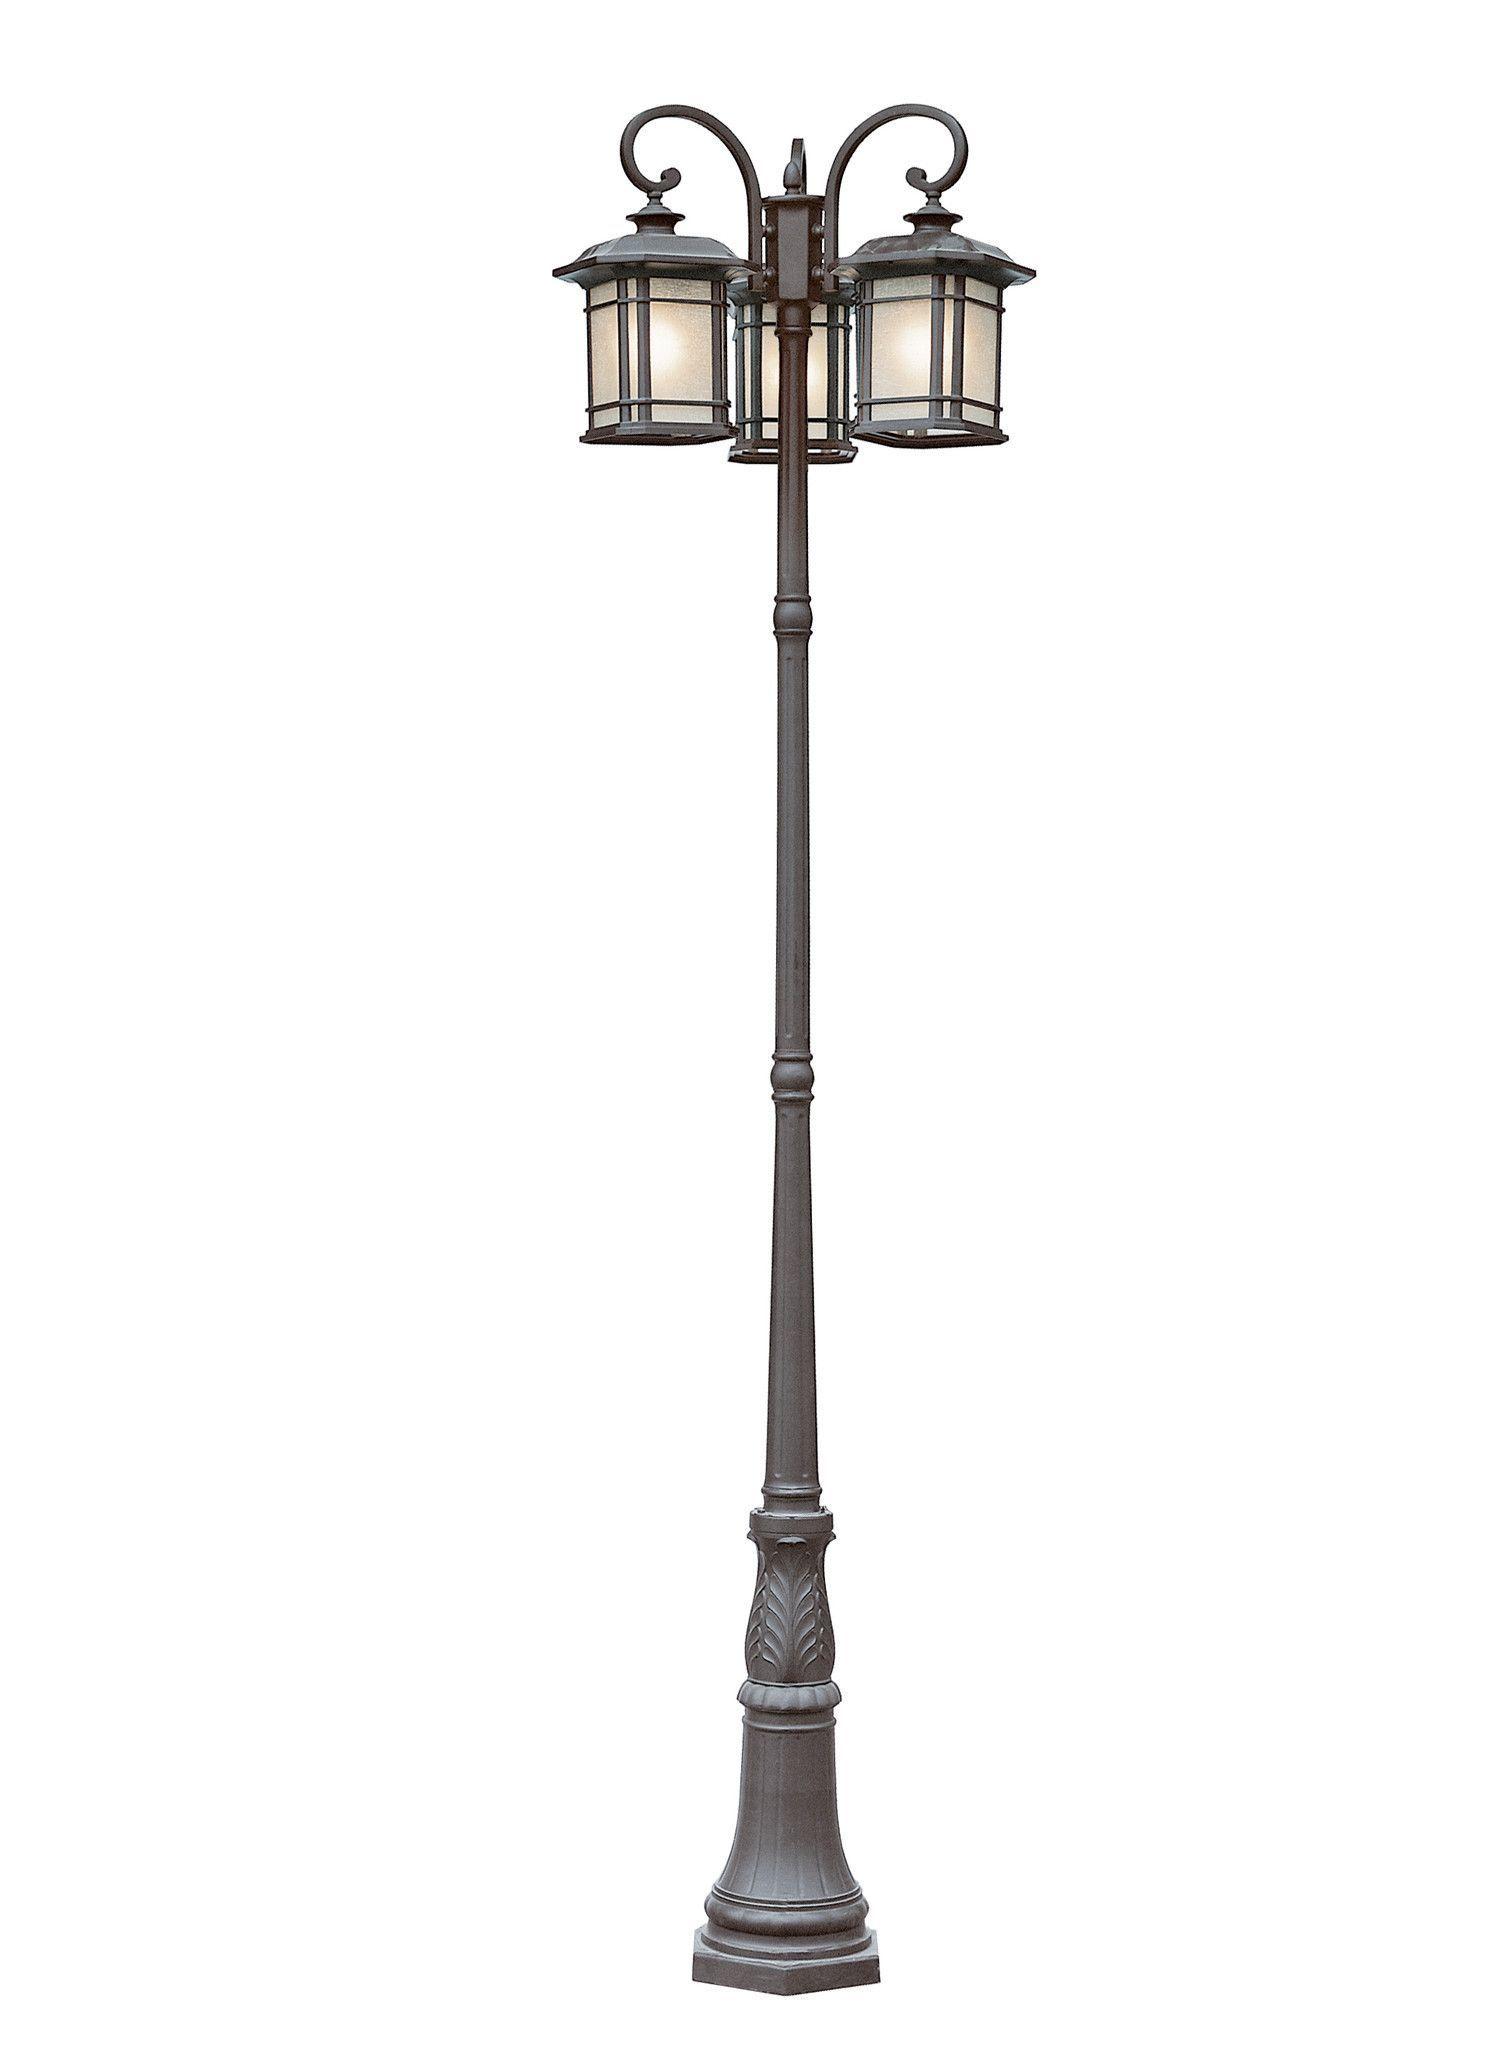 Trans Globe Lighting Pl 5827 Bk Corner Window 3 Lantern Lamp Post Lamp Post Lights Outdoor Post Lights Post Lights